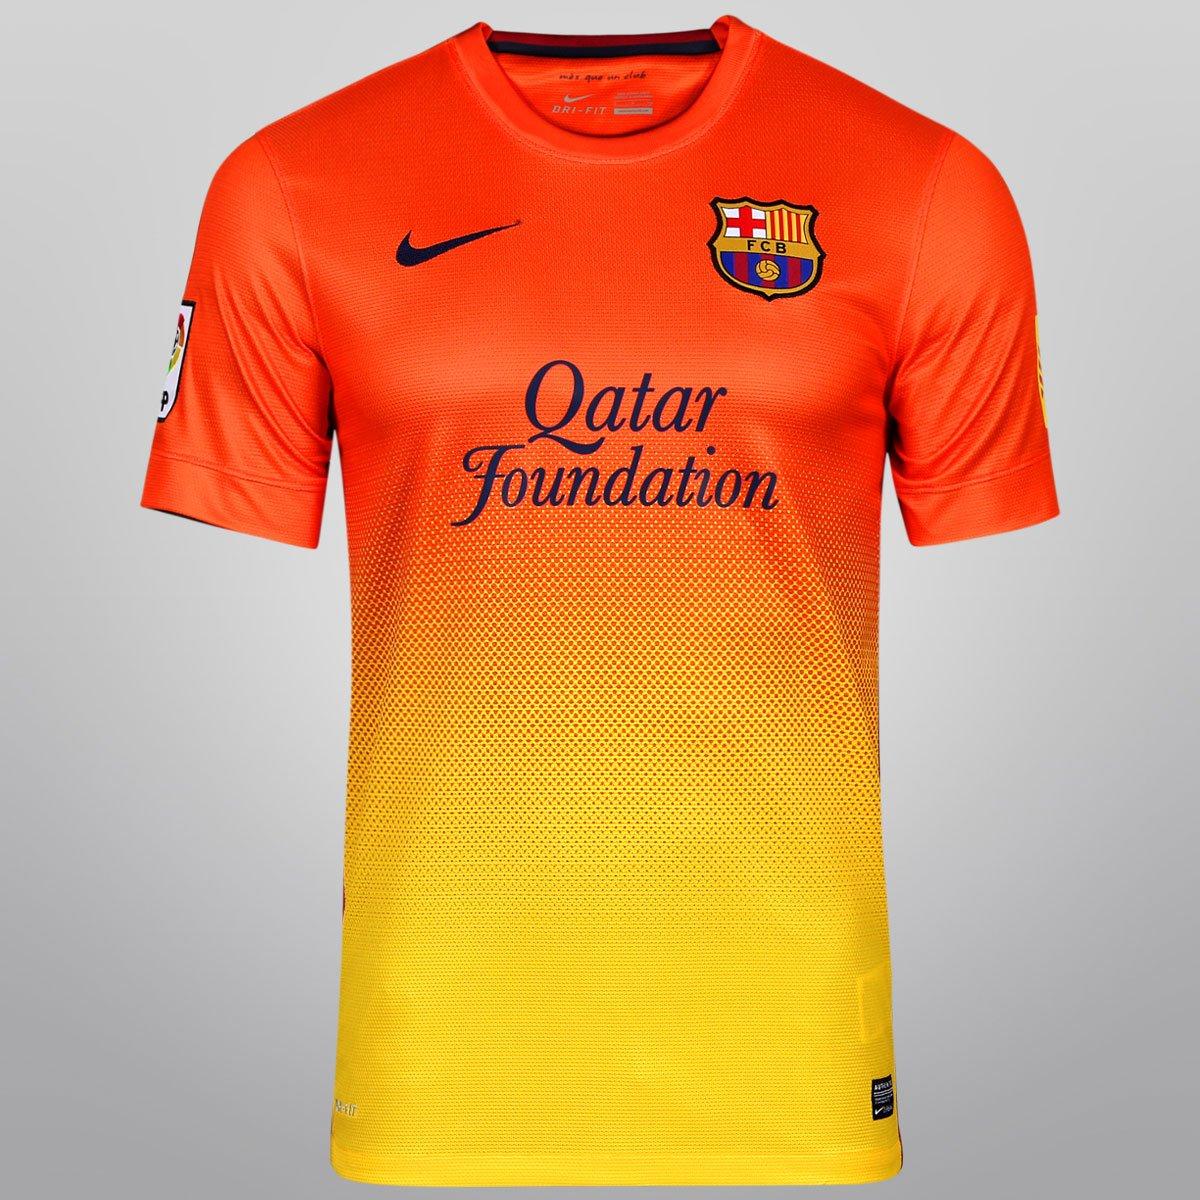 4b2848d162ed1 Camisa Nike Barcelona Away 12 13 s nº - Compre Agora